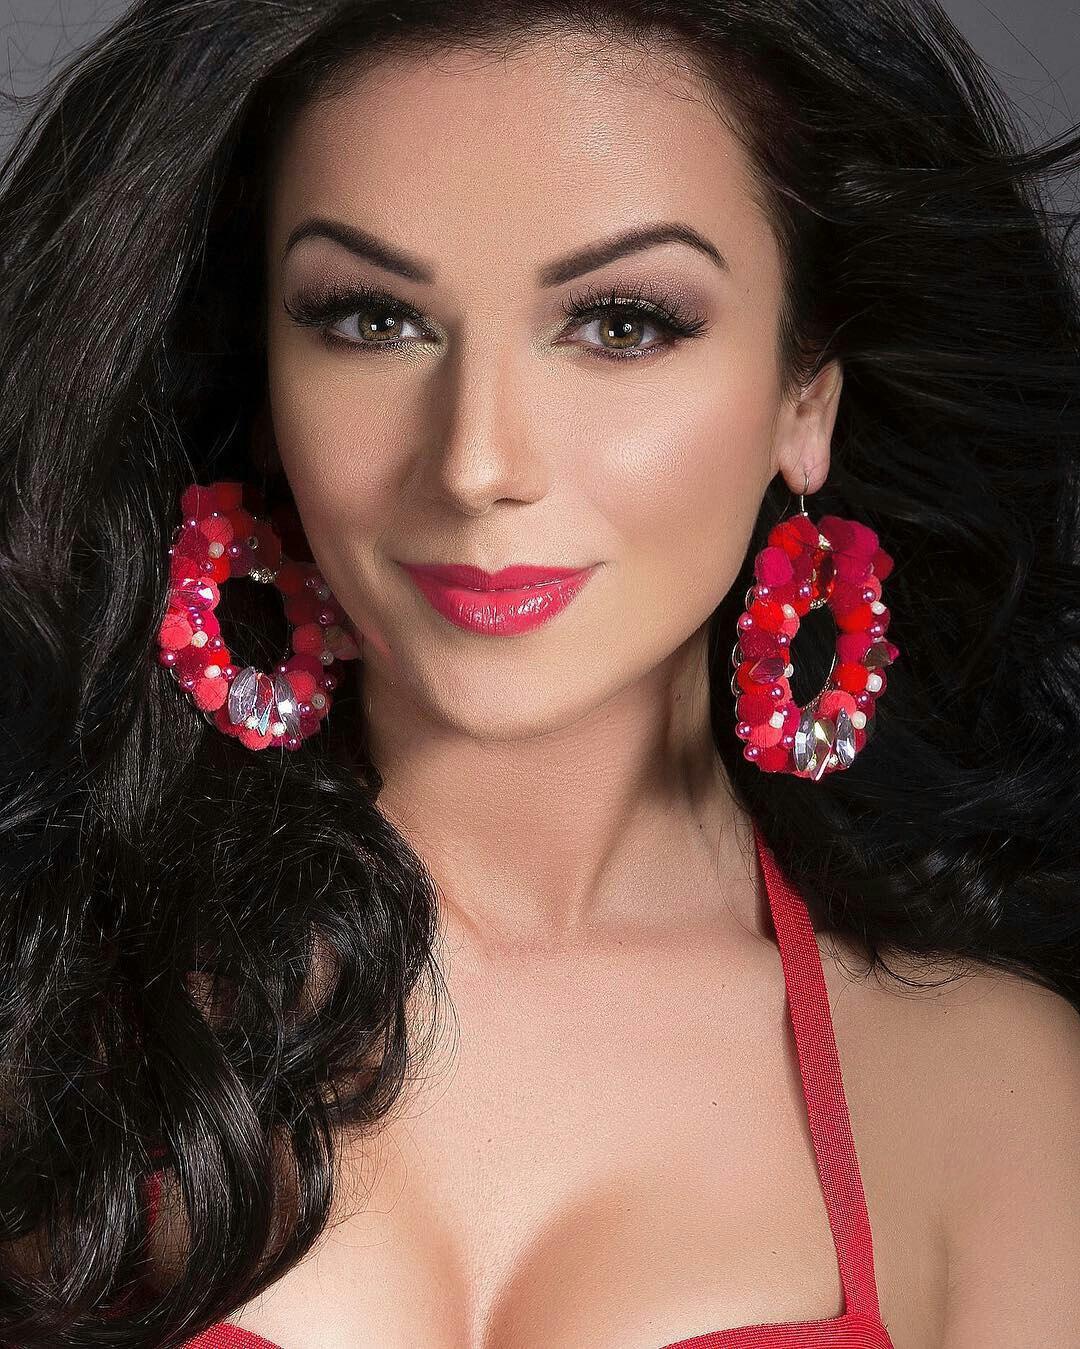 eye makeup ideas for red dress